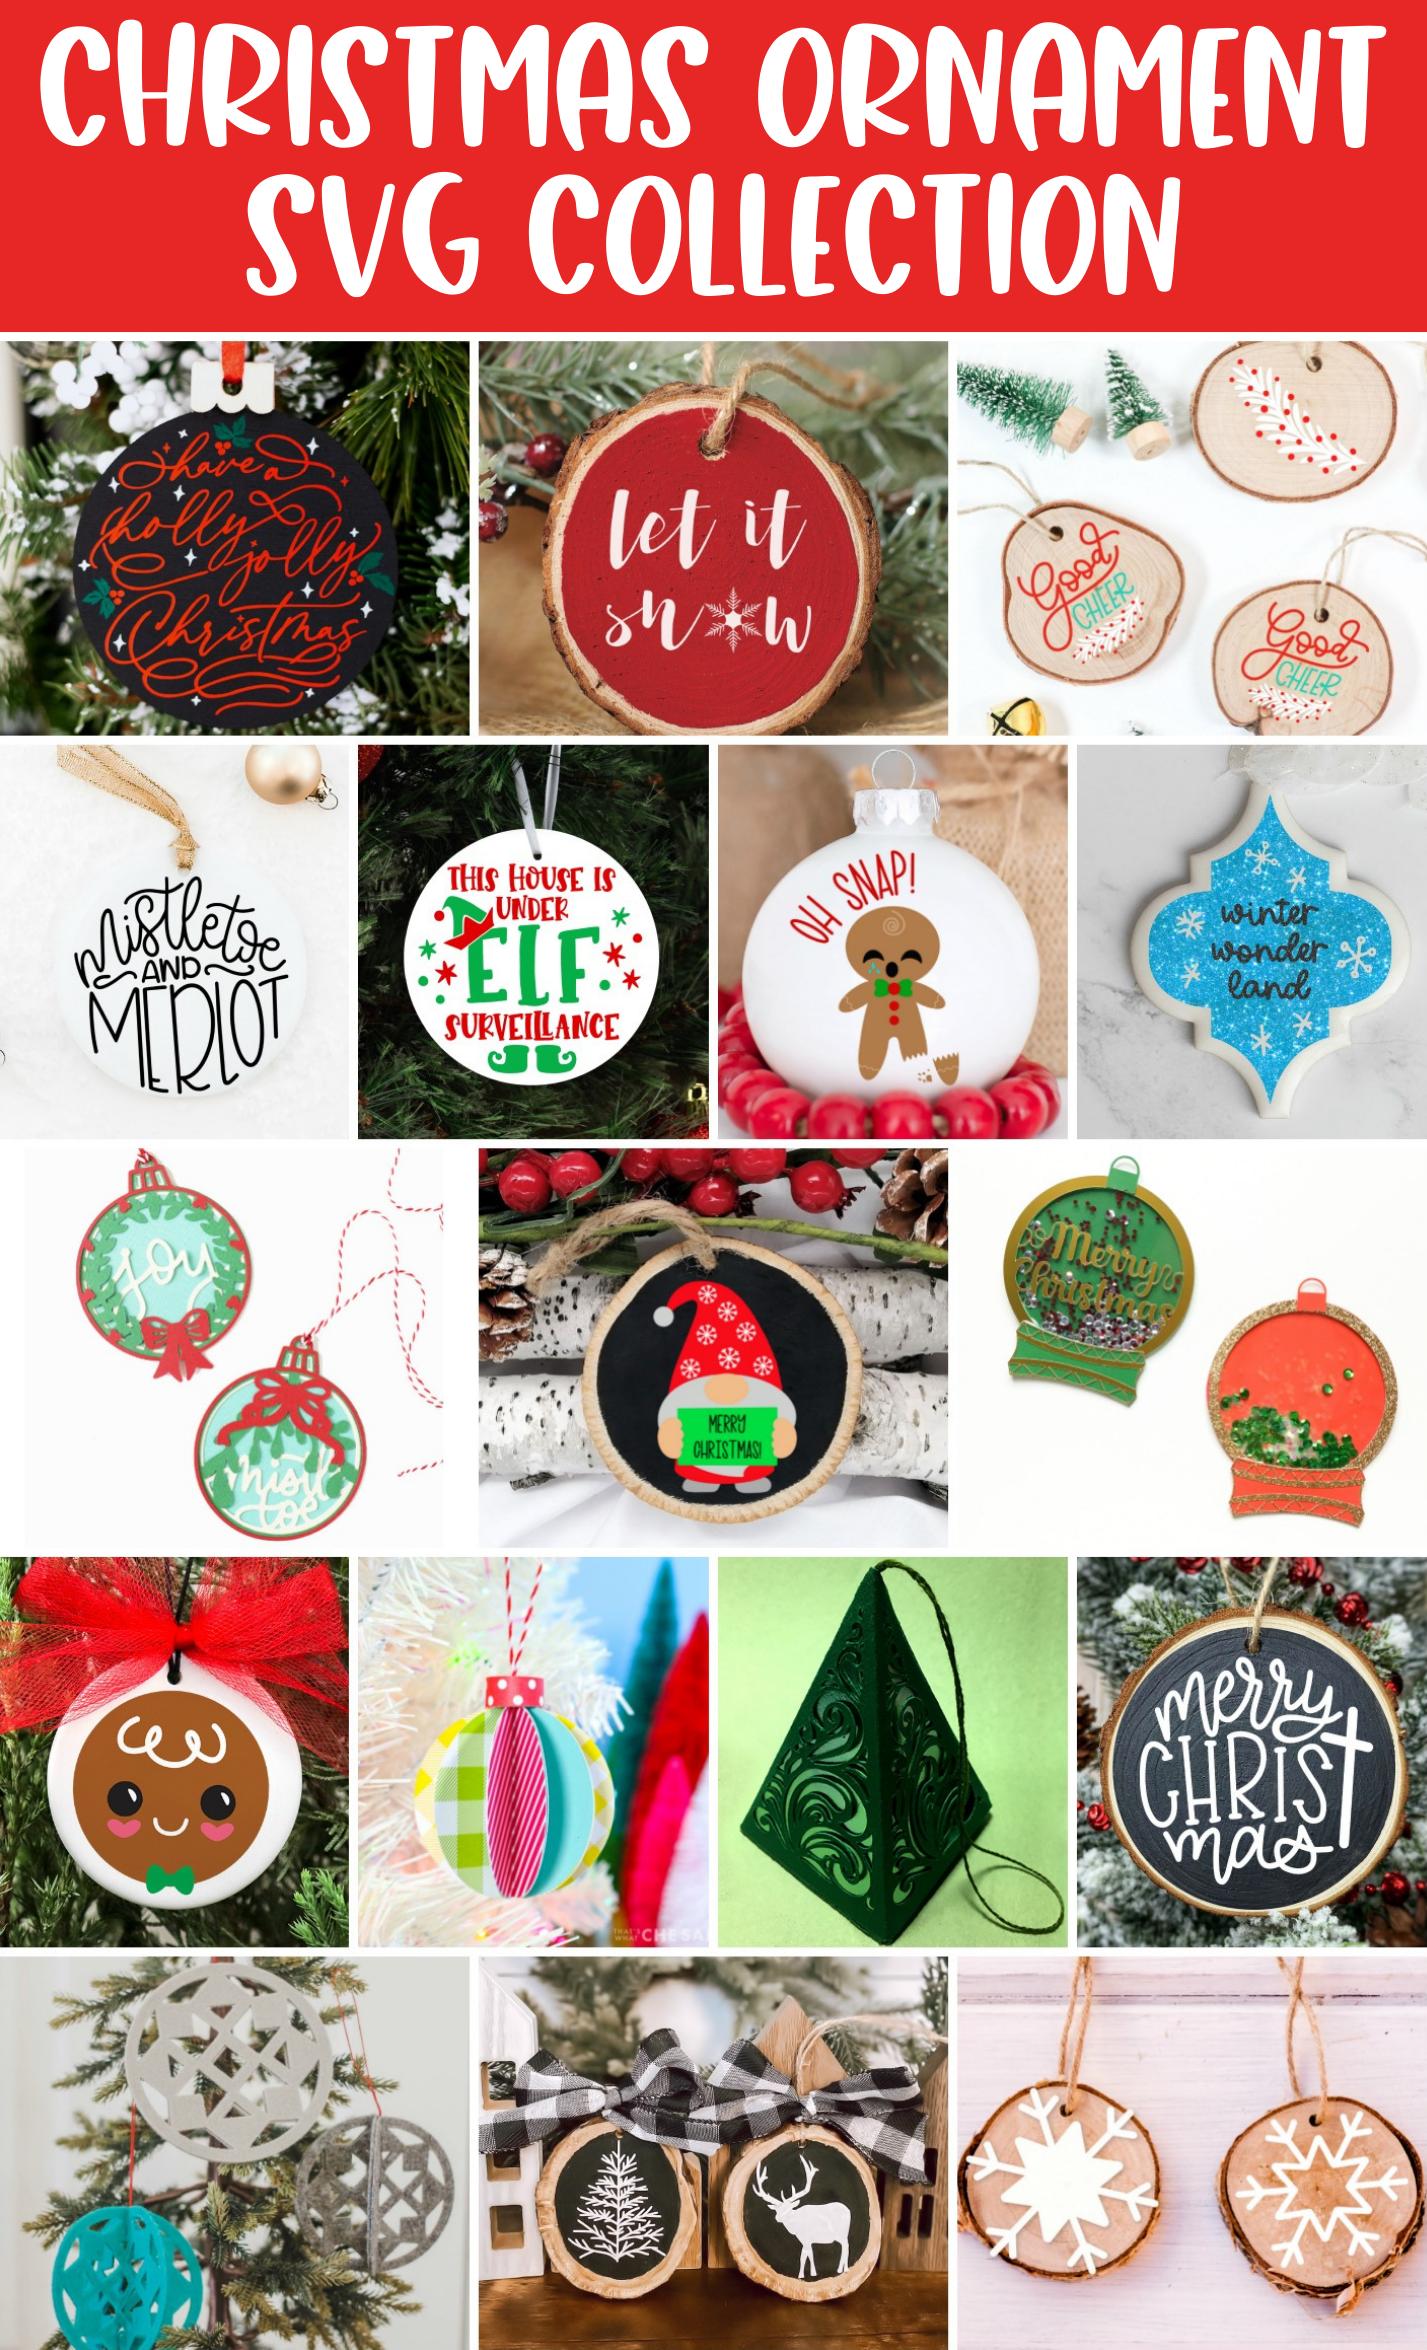 Elf Surveillance SVG - 17 Free Ornament SVG Cut Files